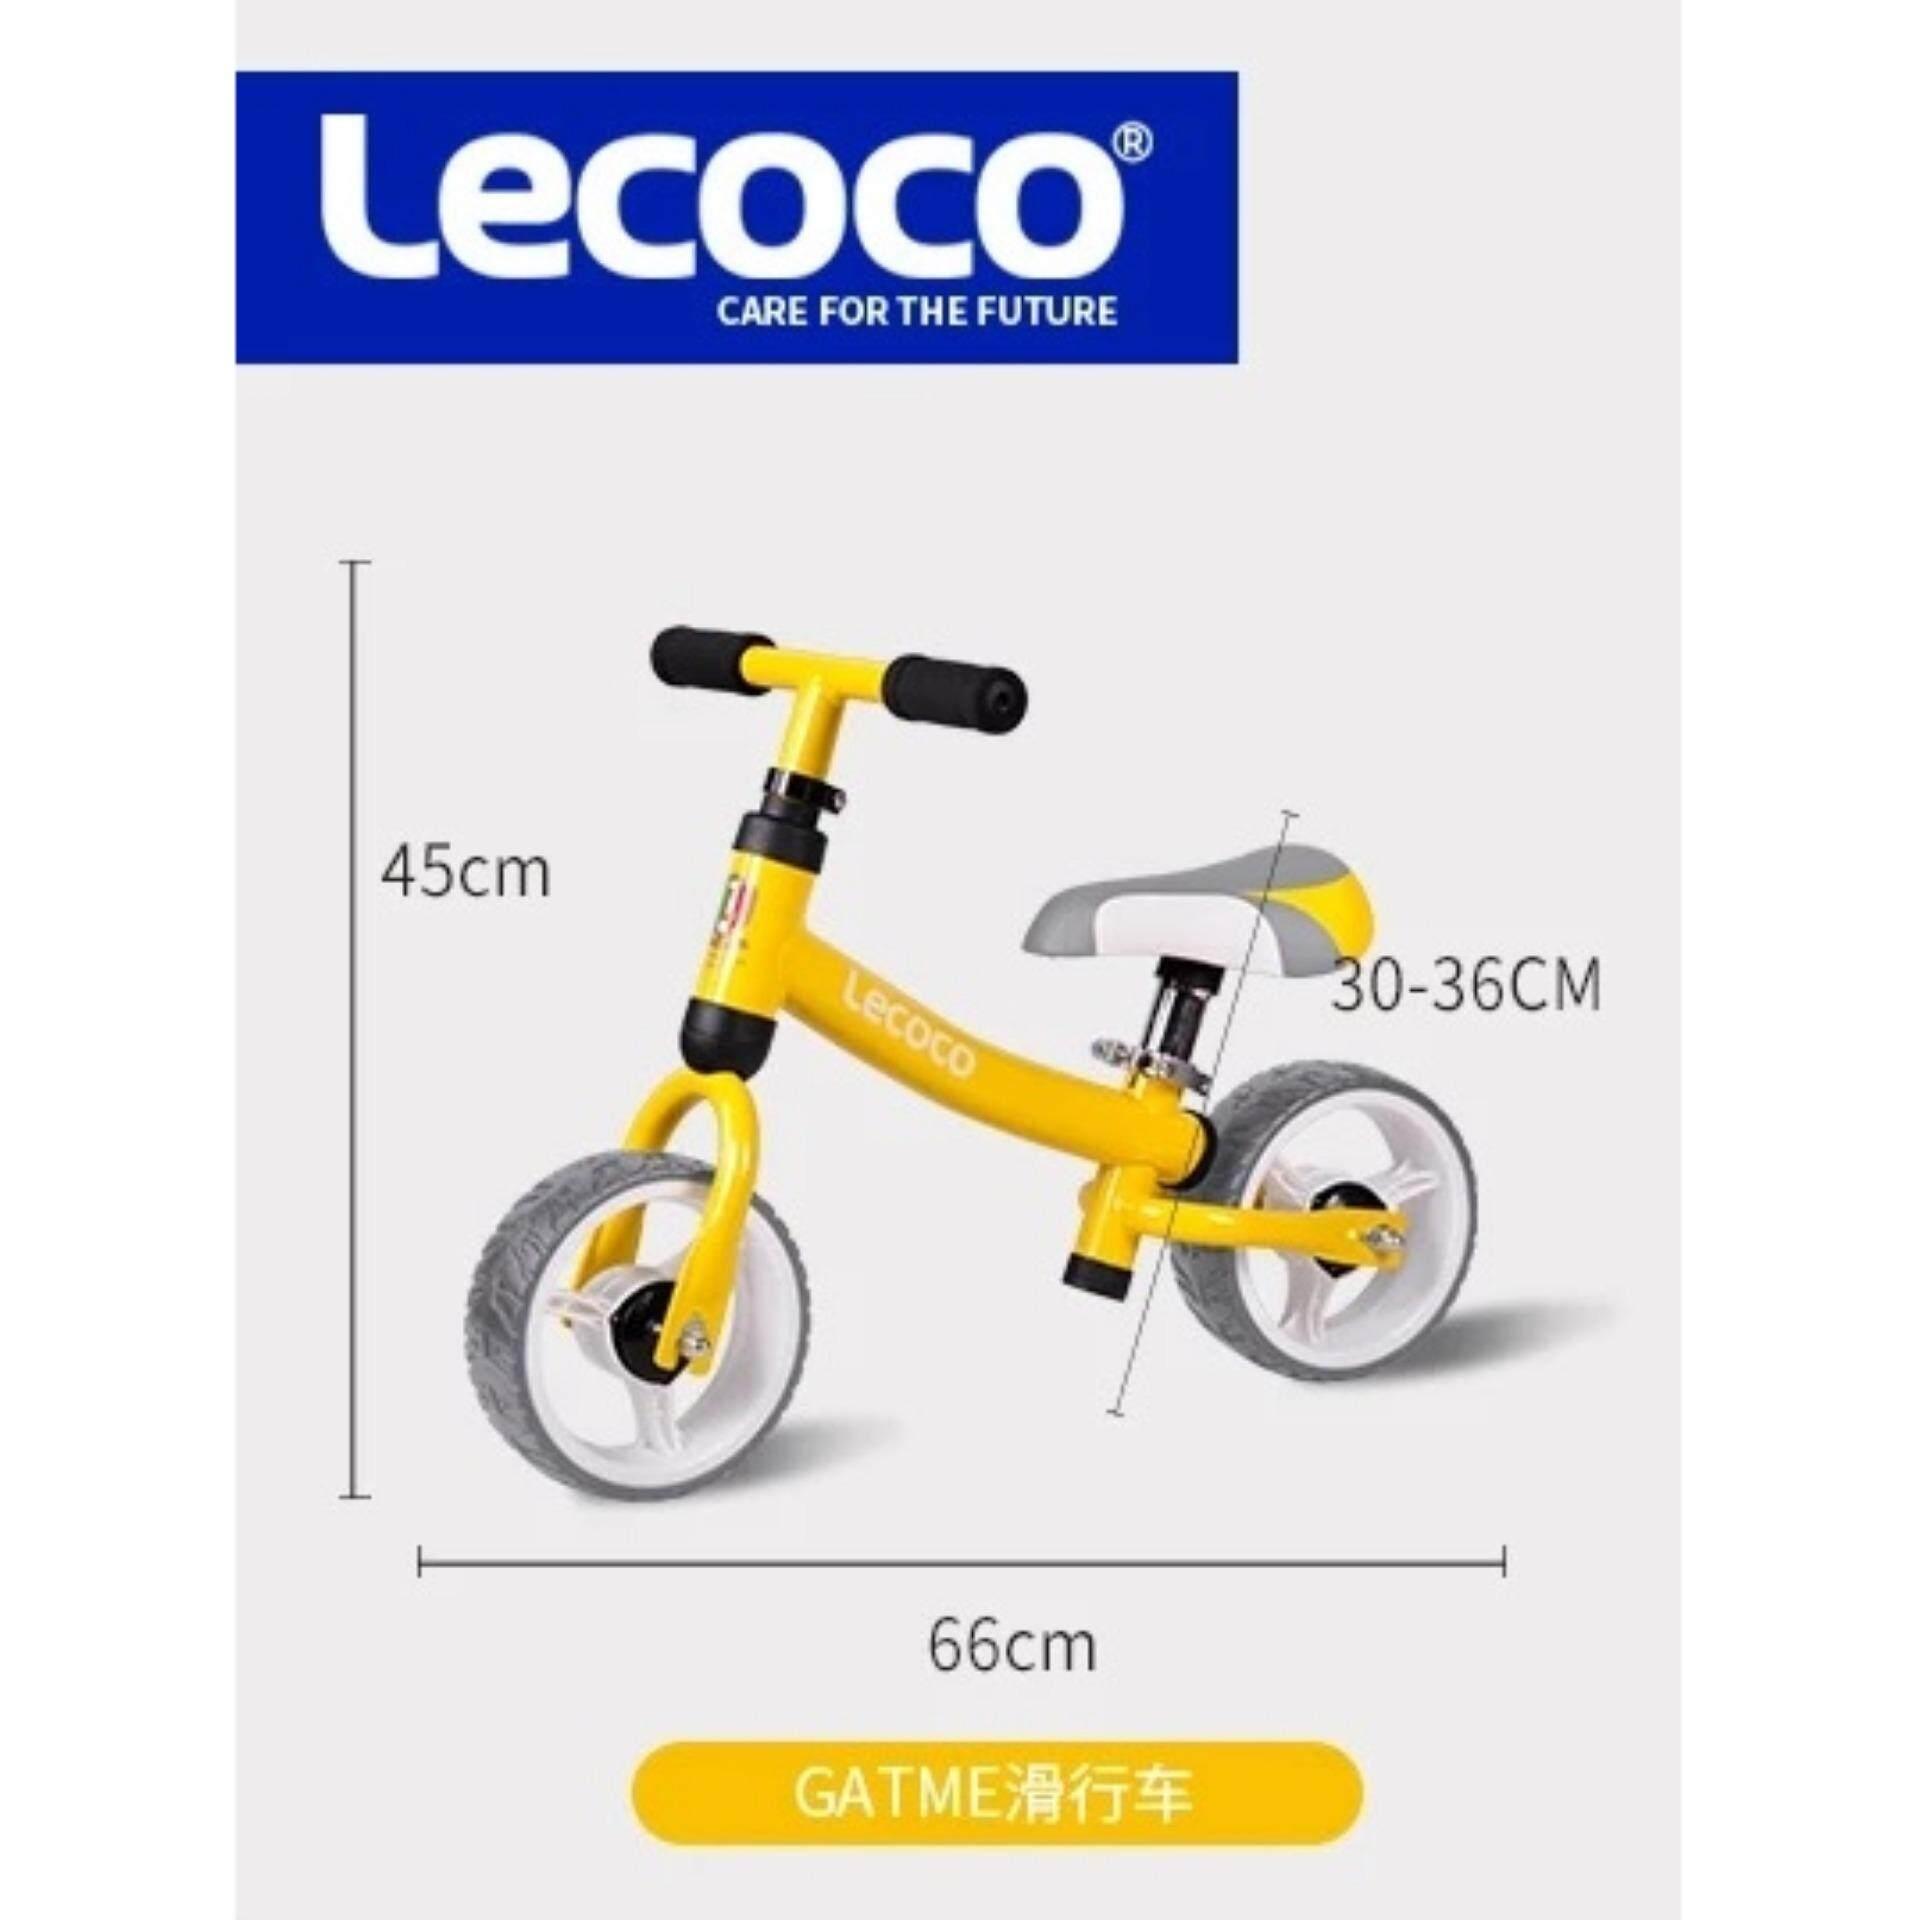 Lecoco Gatme Mini Series Balance Bike for 2 ~ 4 years old kids